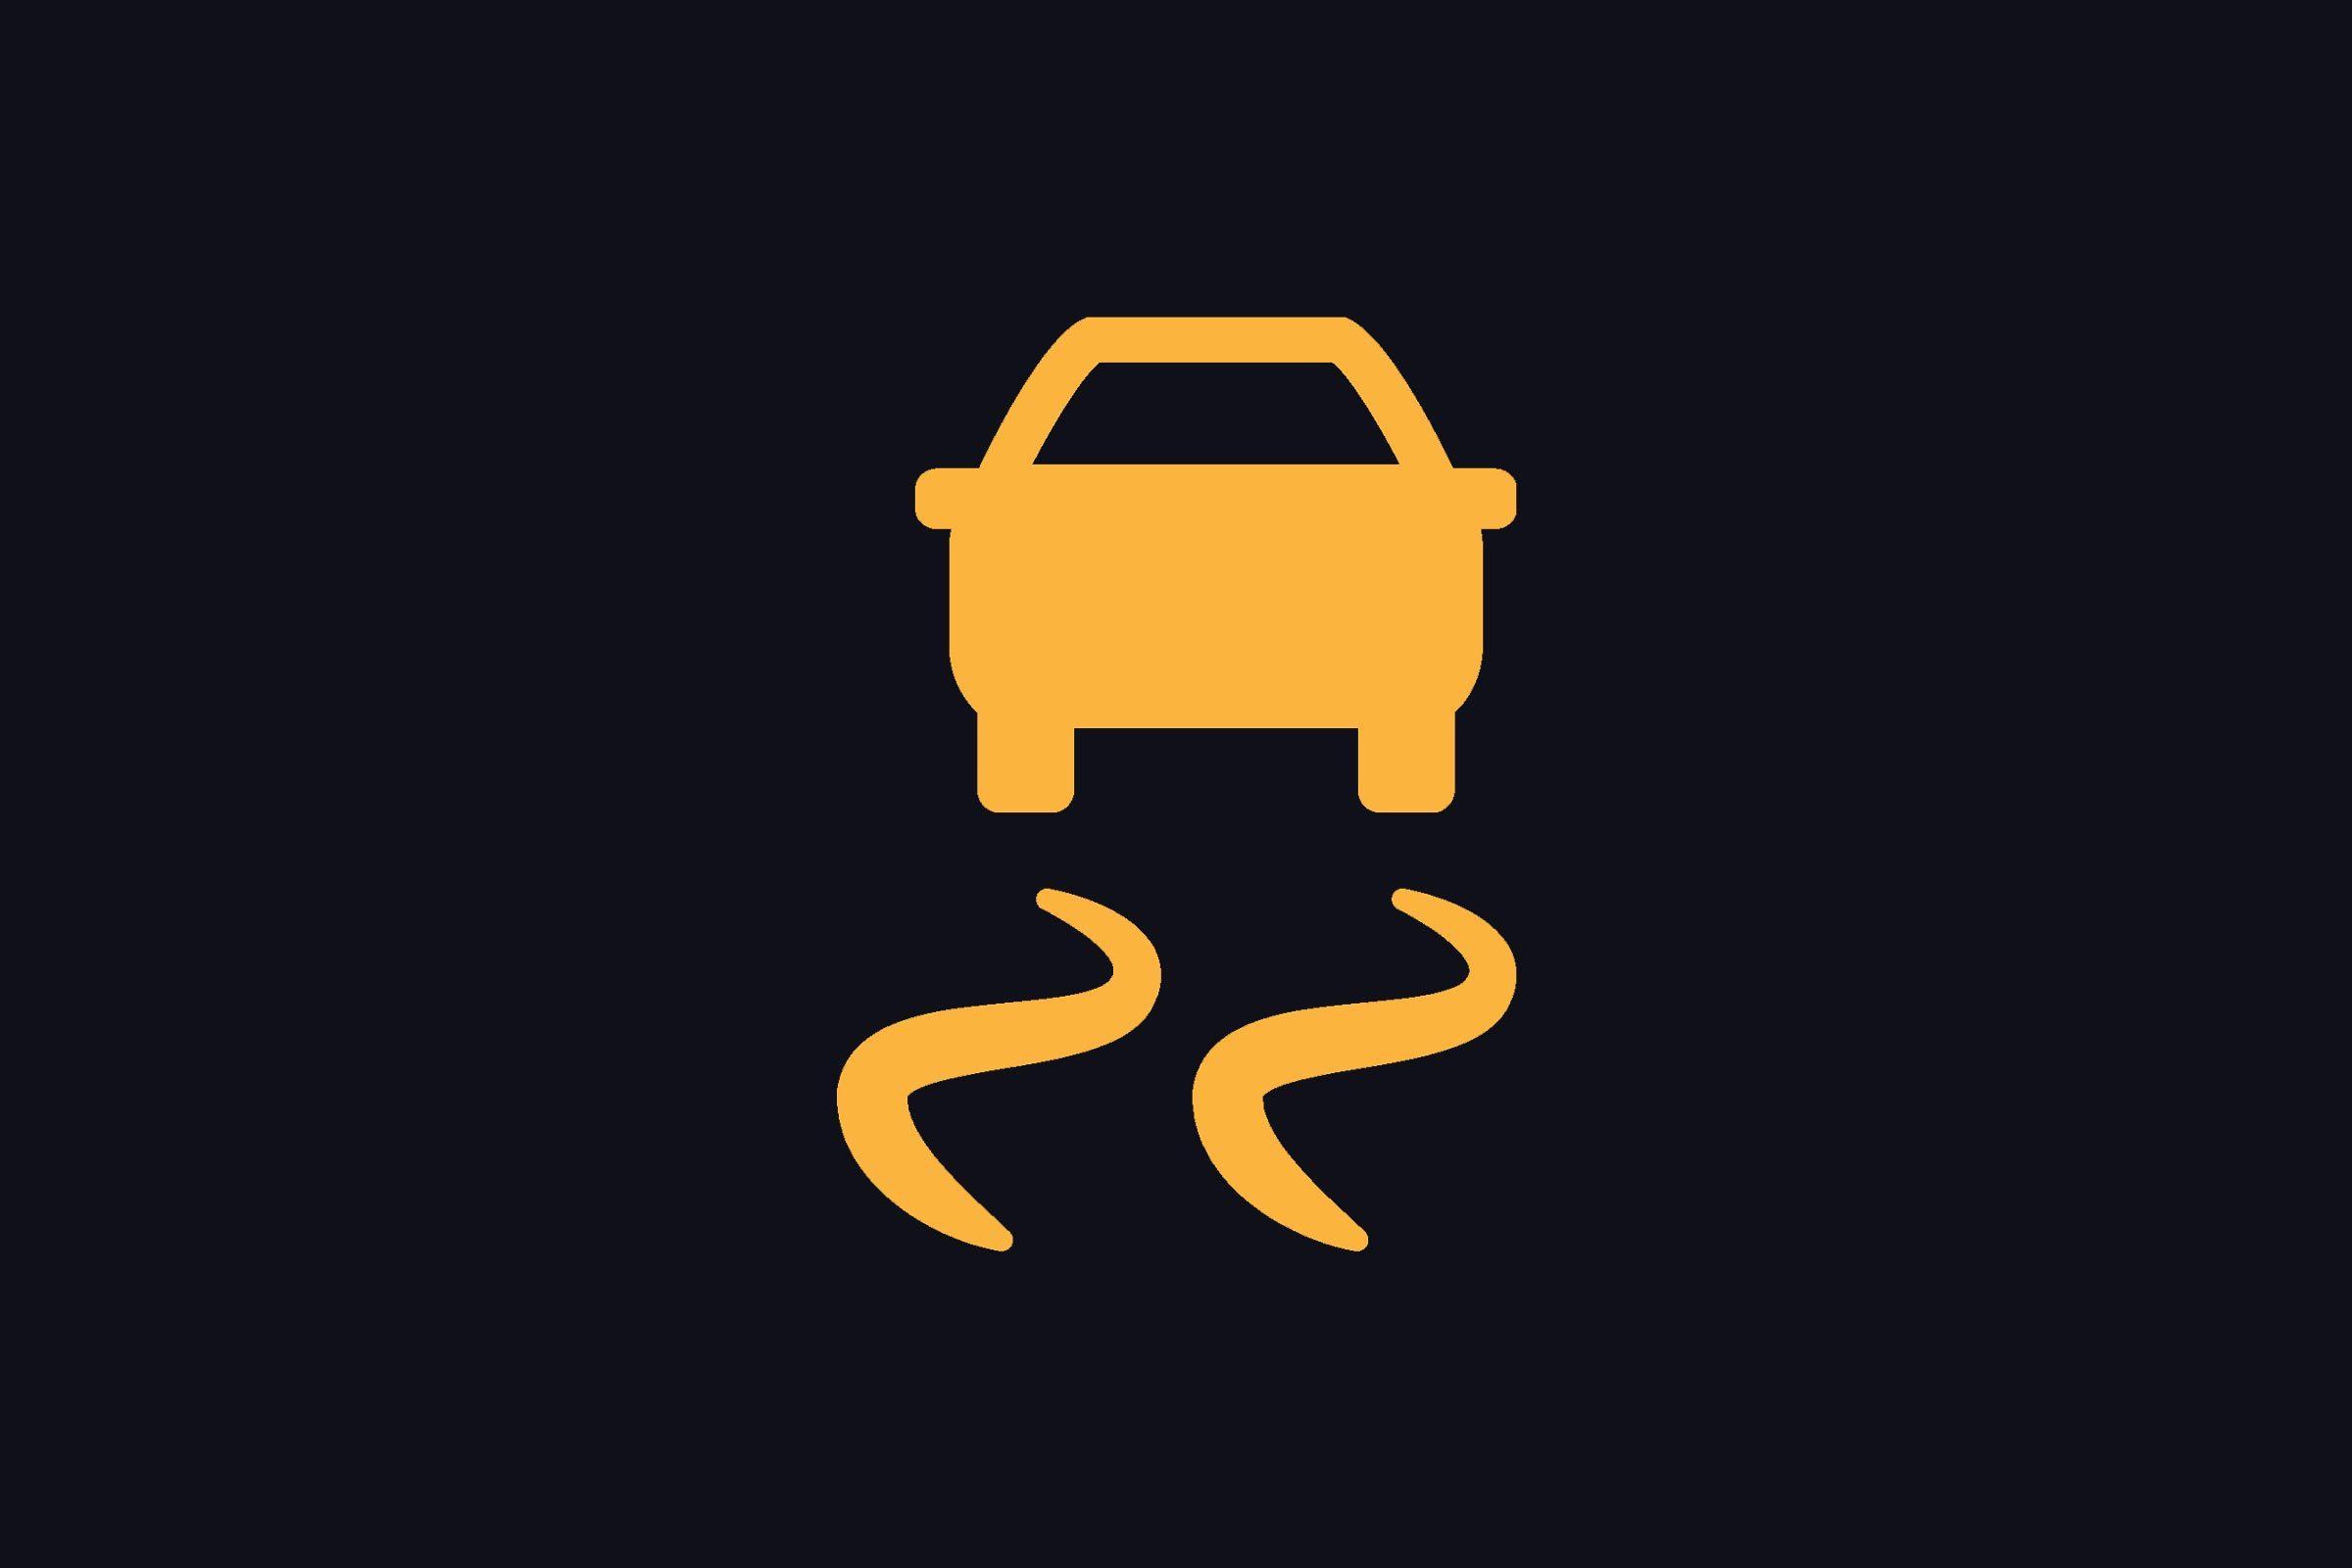 traction control symbol